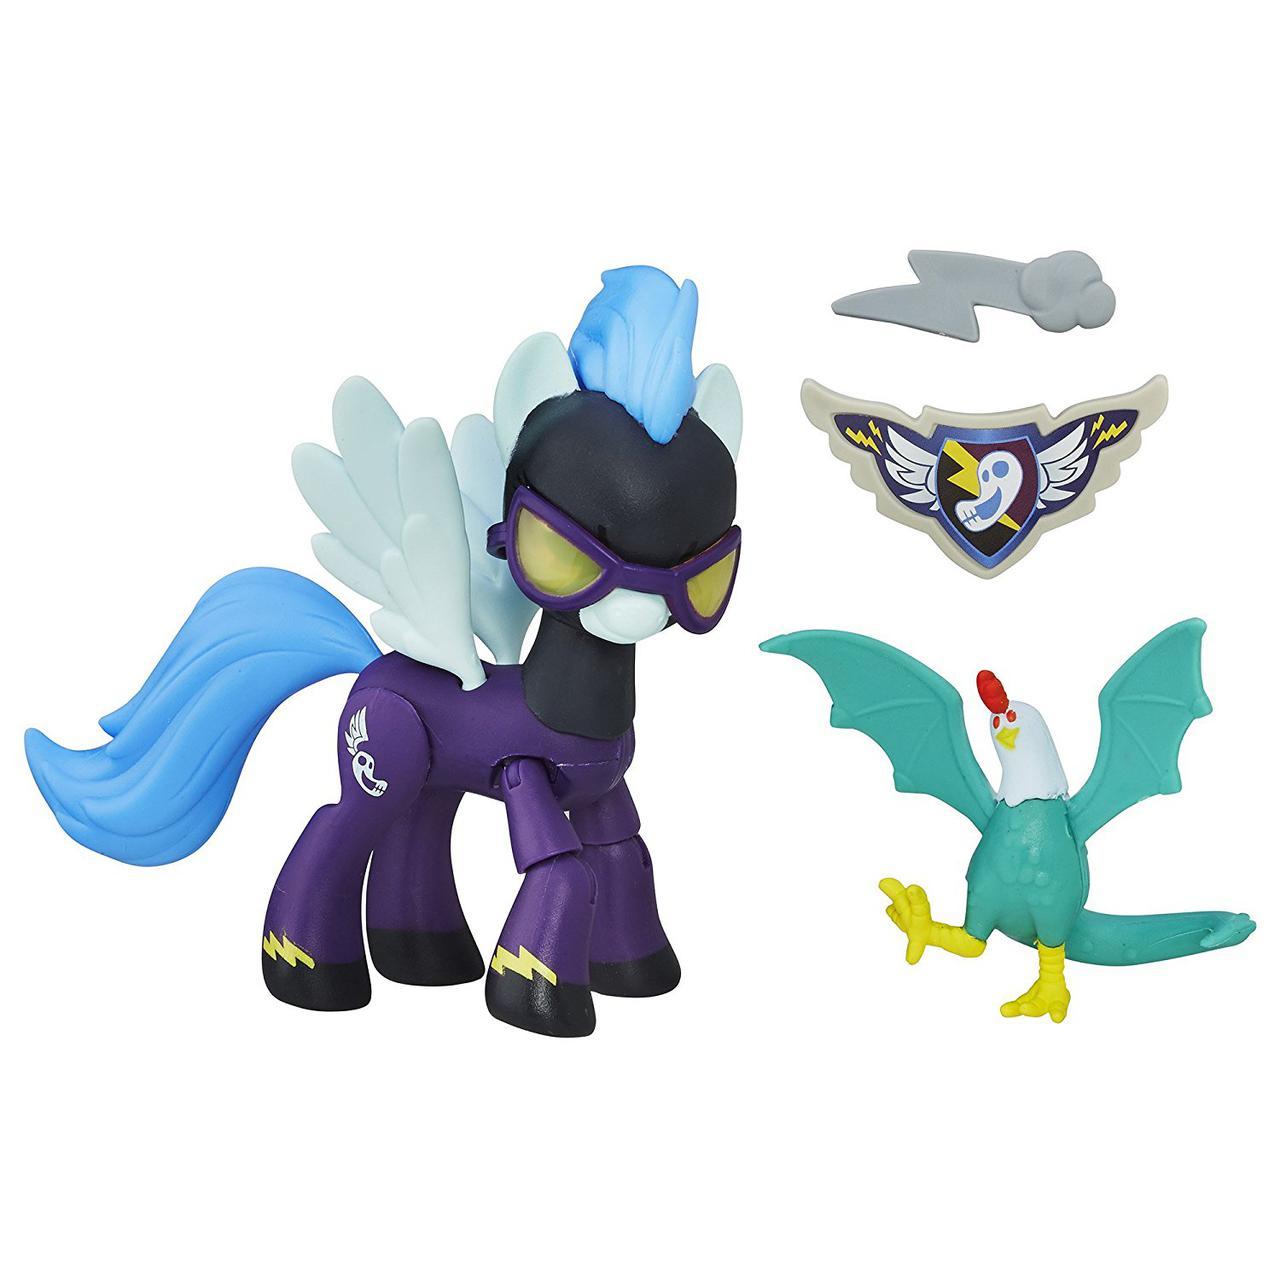 My Little Pony Фигурка пони Стражи гармонии шедовболтс Guardians of Harmony Shadowbolts Pony and Cockatrice